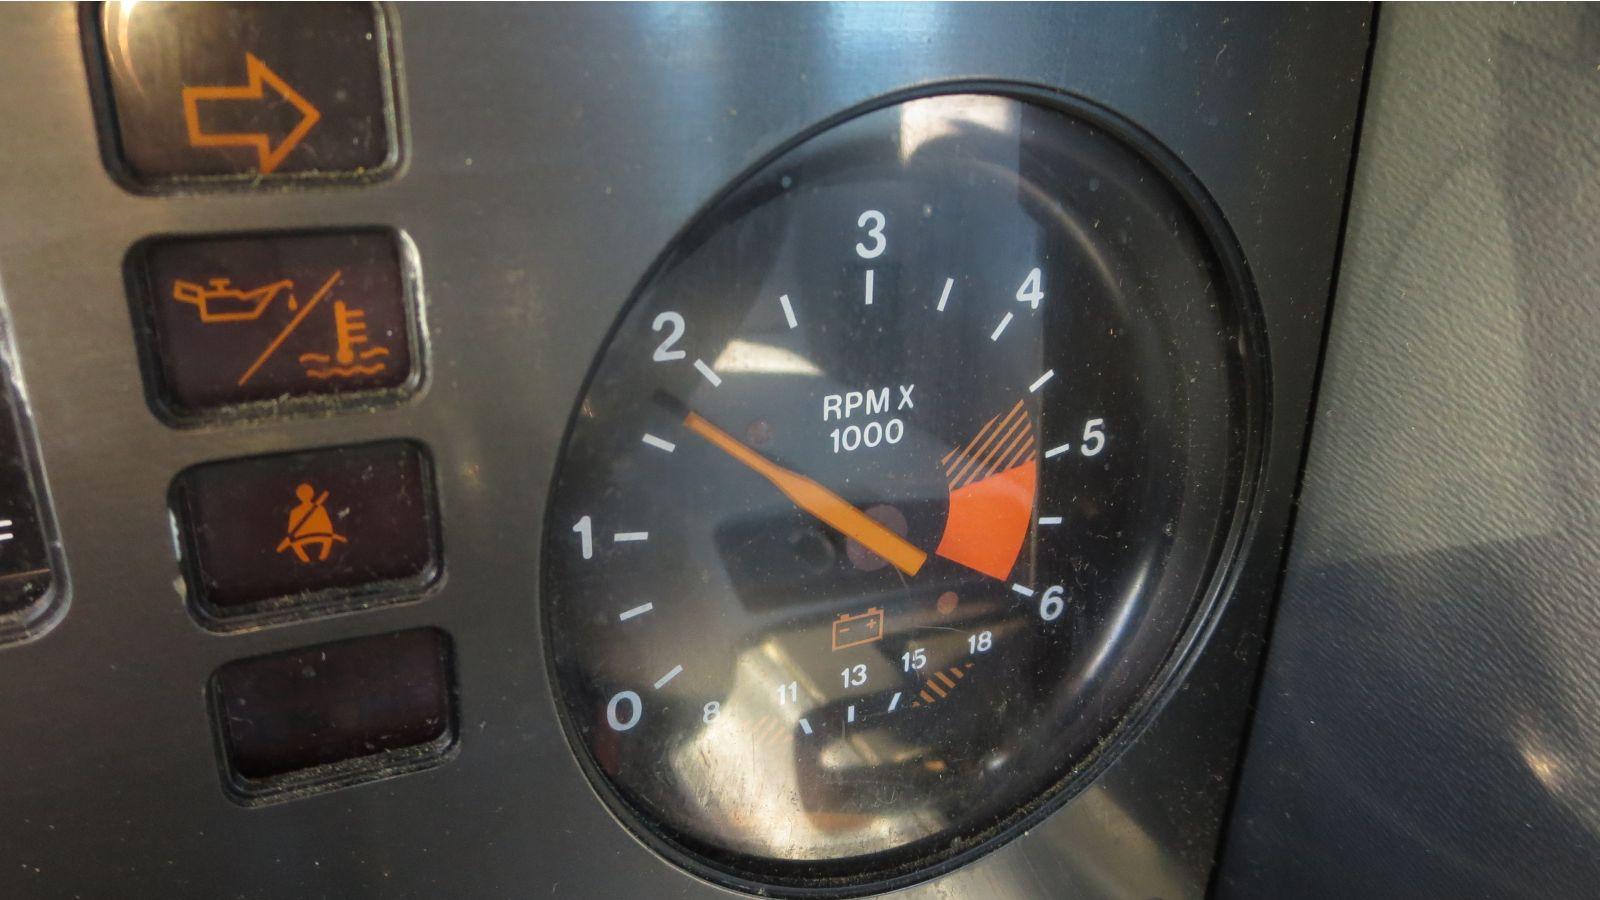 Worksheet. Junkyard Gem 1984 Pontiac Fiero 2M4  Autoblog